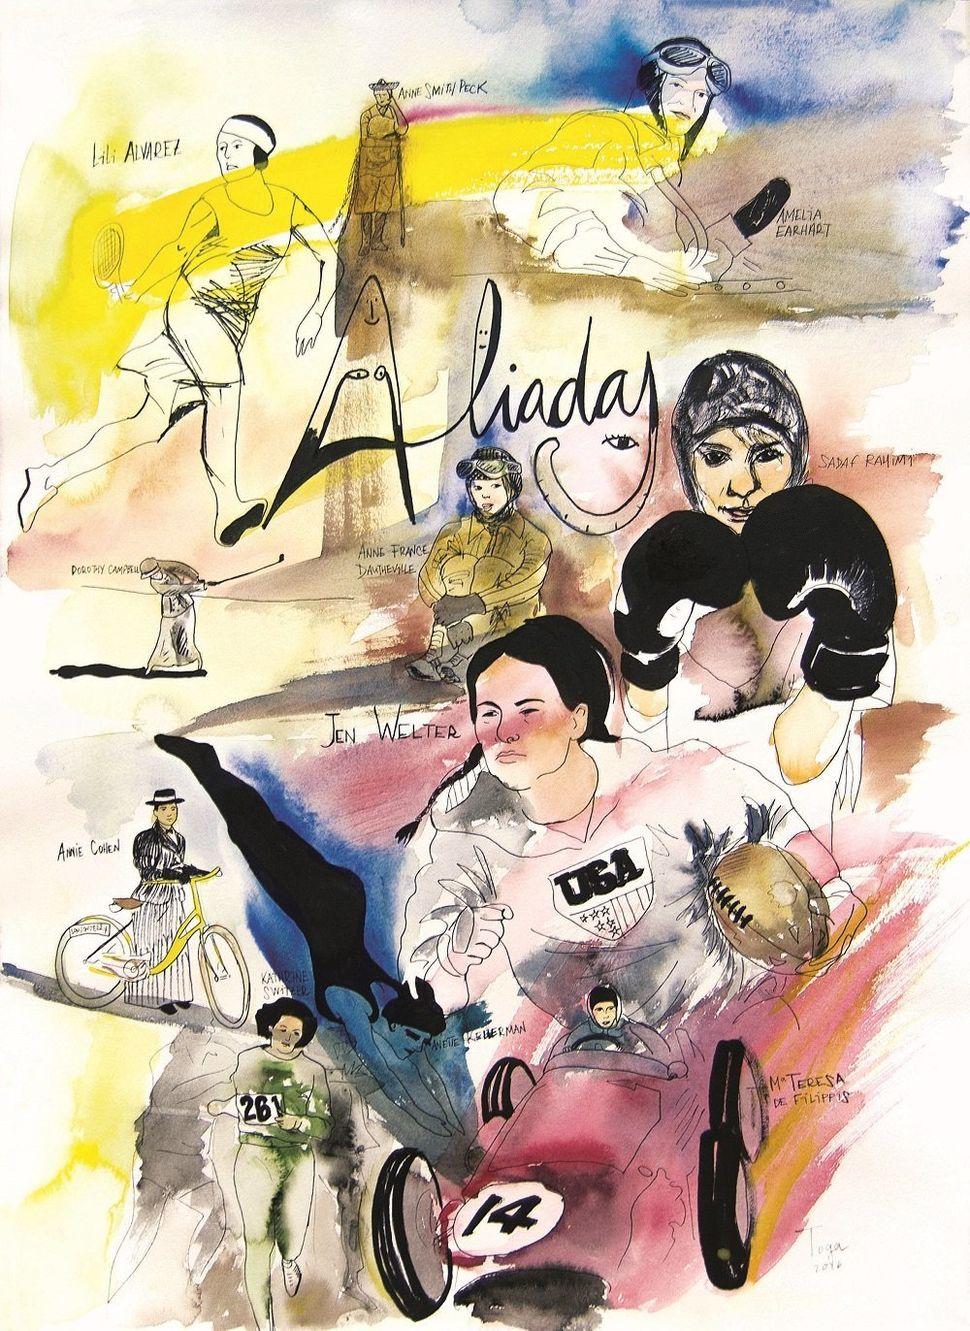 "<a href=""http://lidiatoga.com/"" target=""_blank"">Lidia Toga</a>"